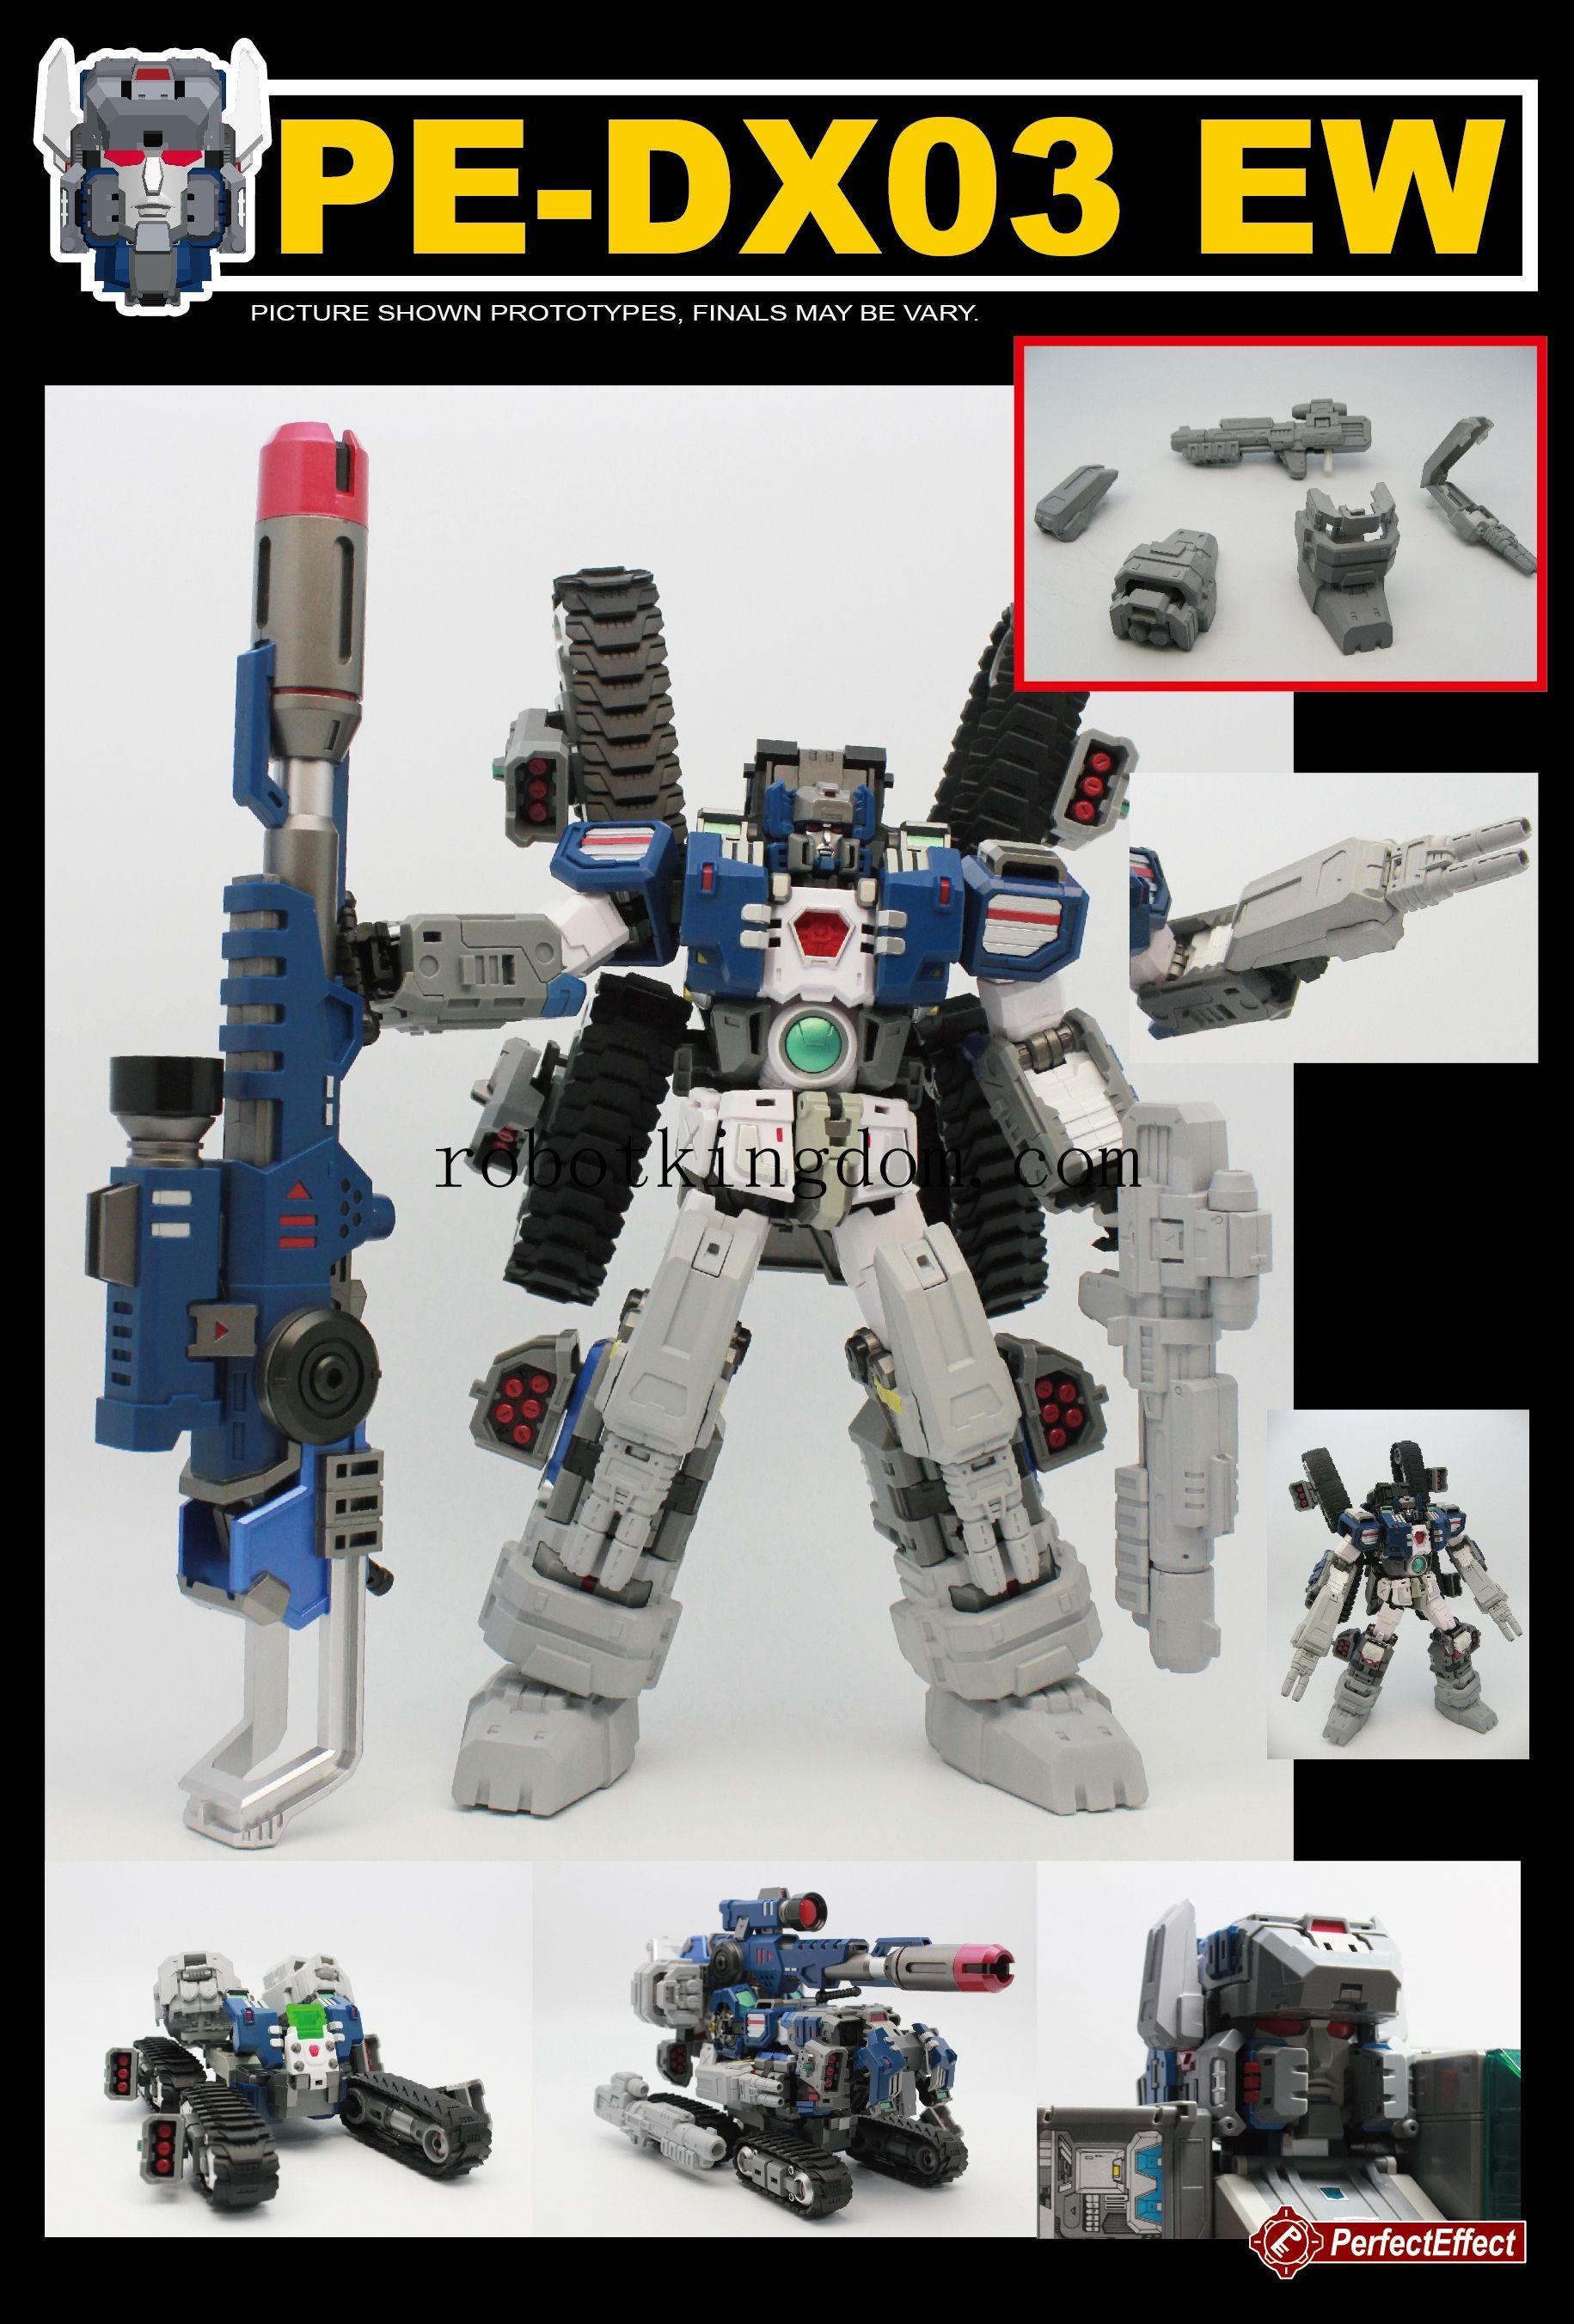 Perfect Effect MOTOBOT PE-DX03 EW Warden Add on Parts